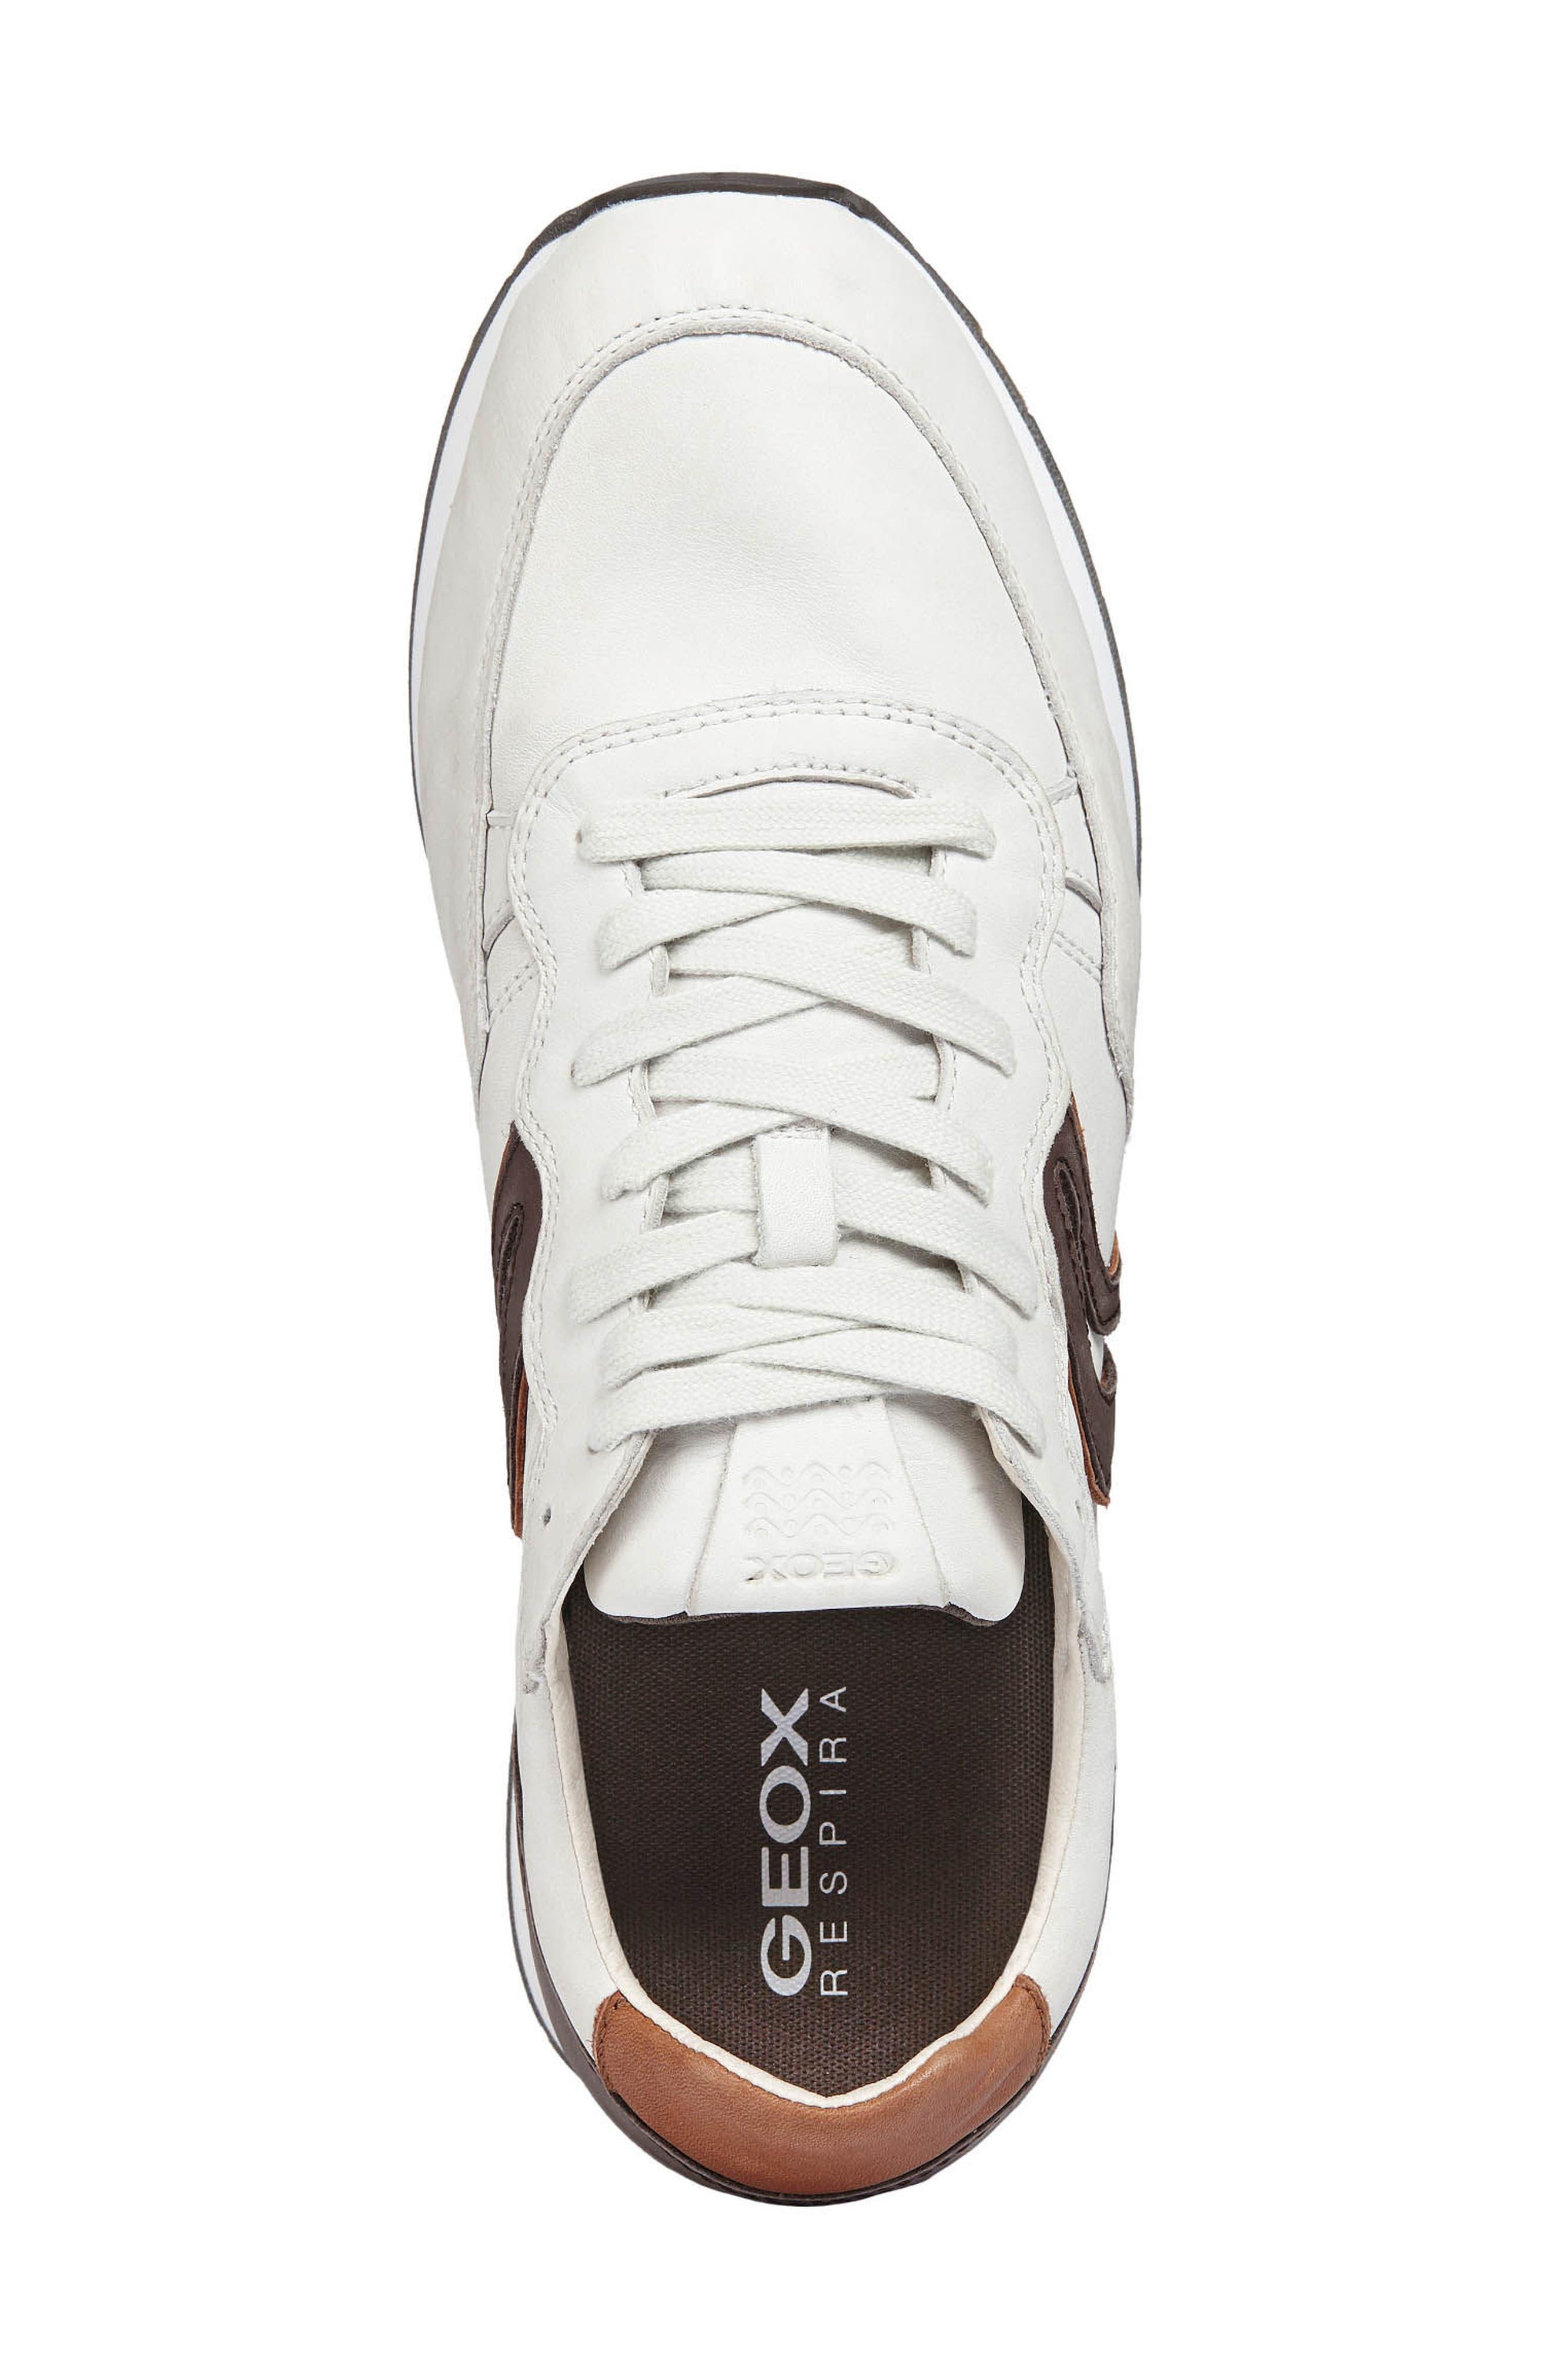 Vincint 1 Sneaker,                             Alternate thumbnail 5, color,                             WHITE/ DARK COFFEE LEATHER